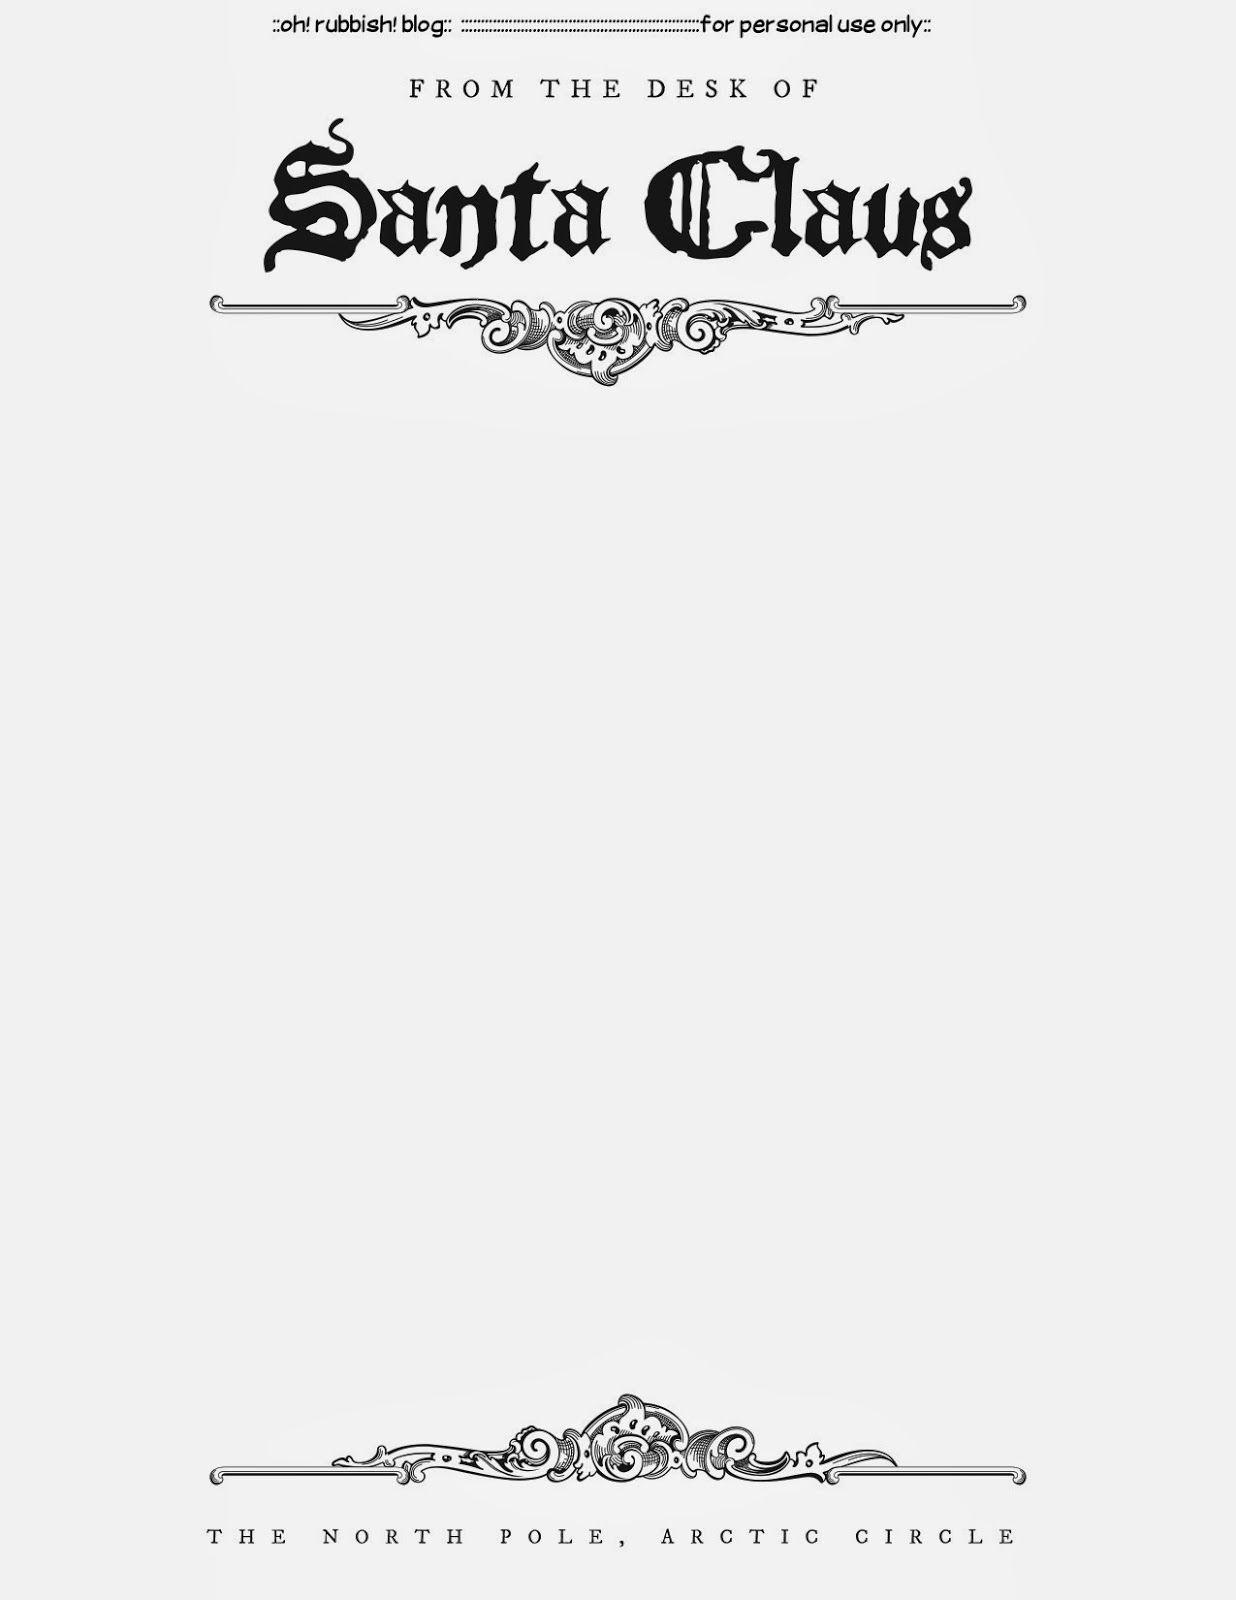 Santa Letter Templates   Christmas Printables 5   Santa Letter - Free Printable Letter From Santa Template